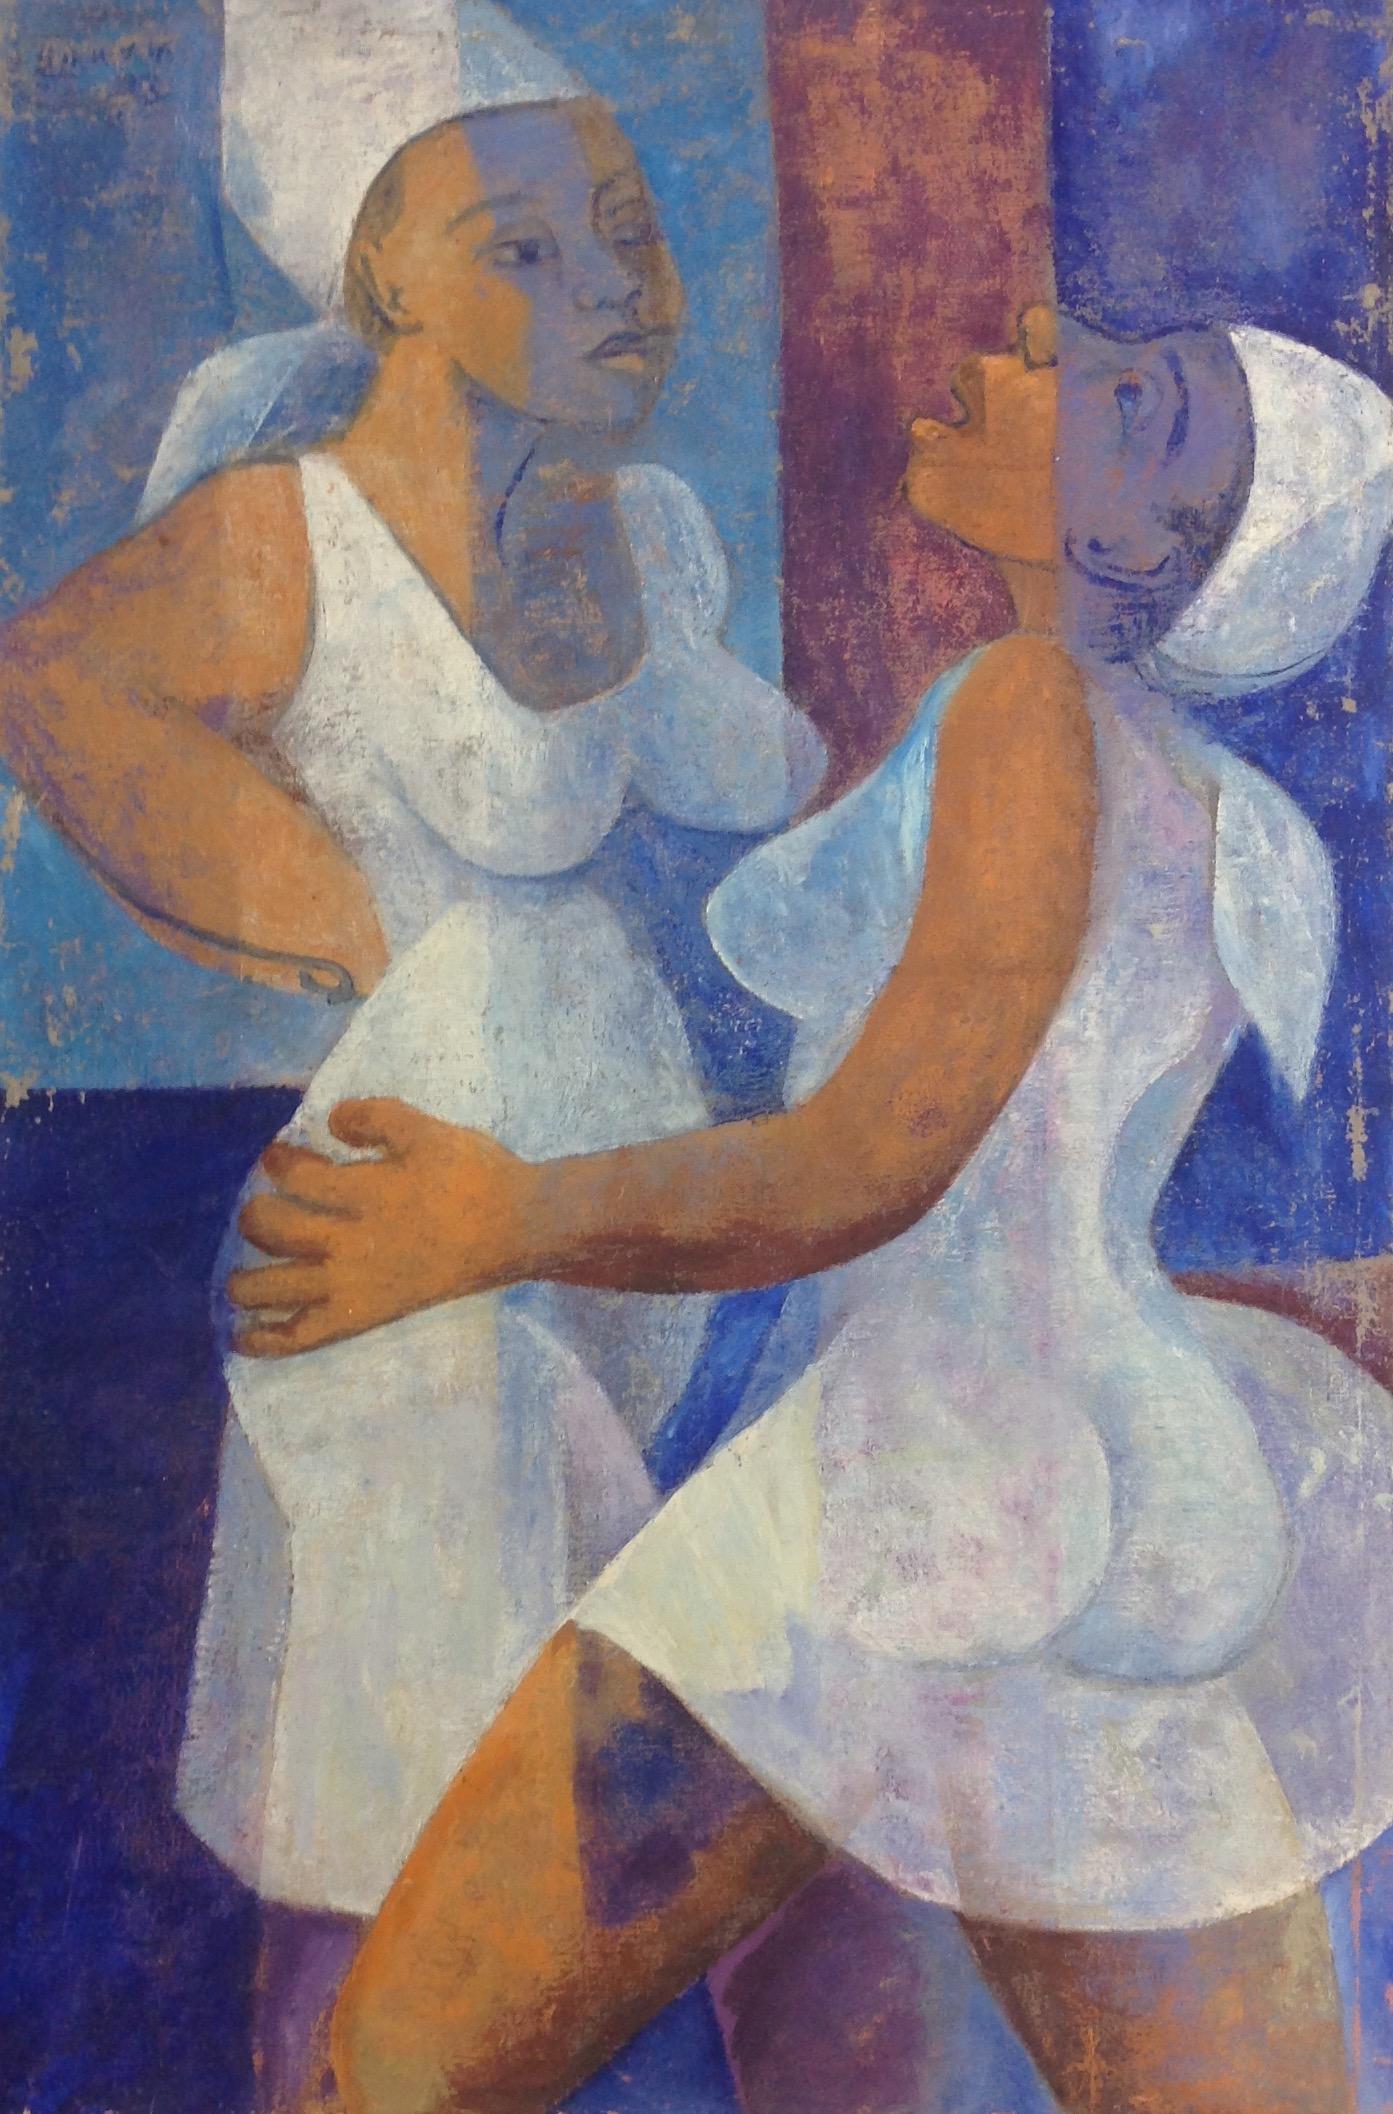 Desruisseau Rose Marie 24X36 #26-3-96 canvas